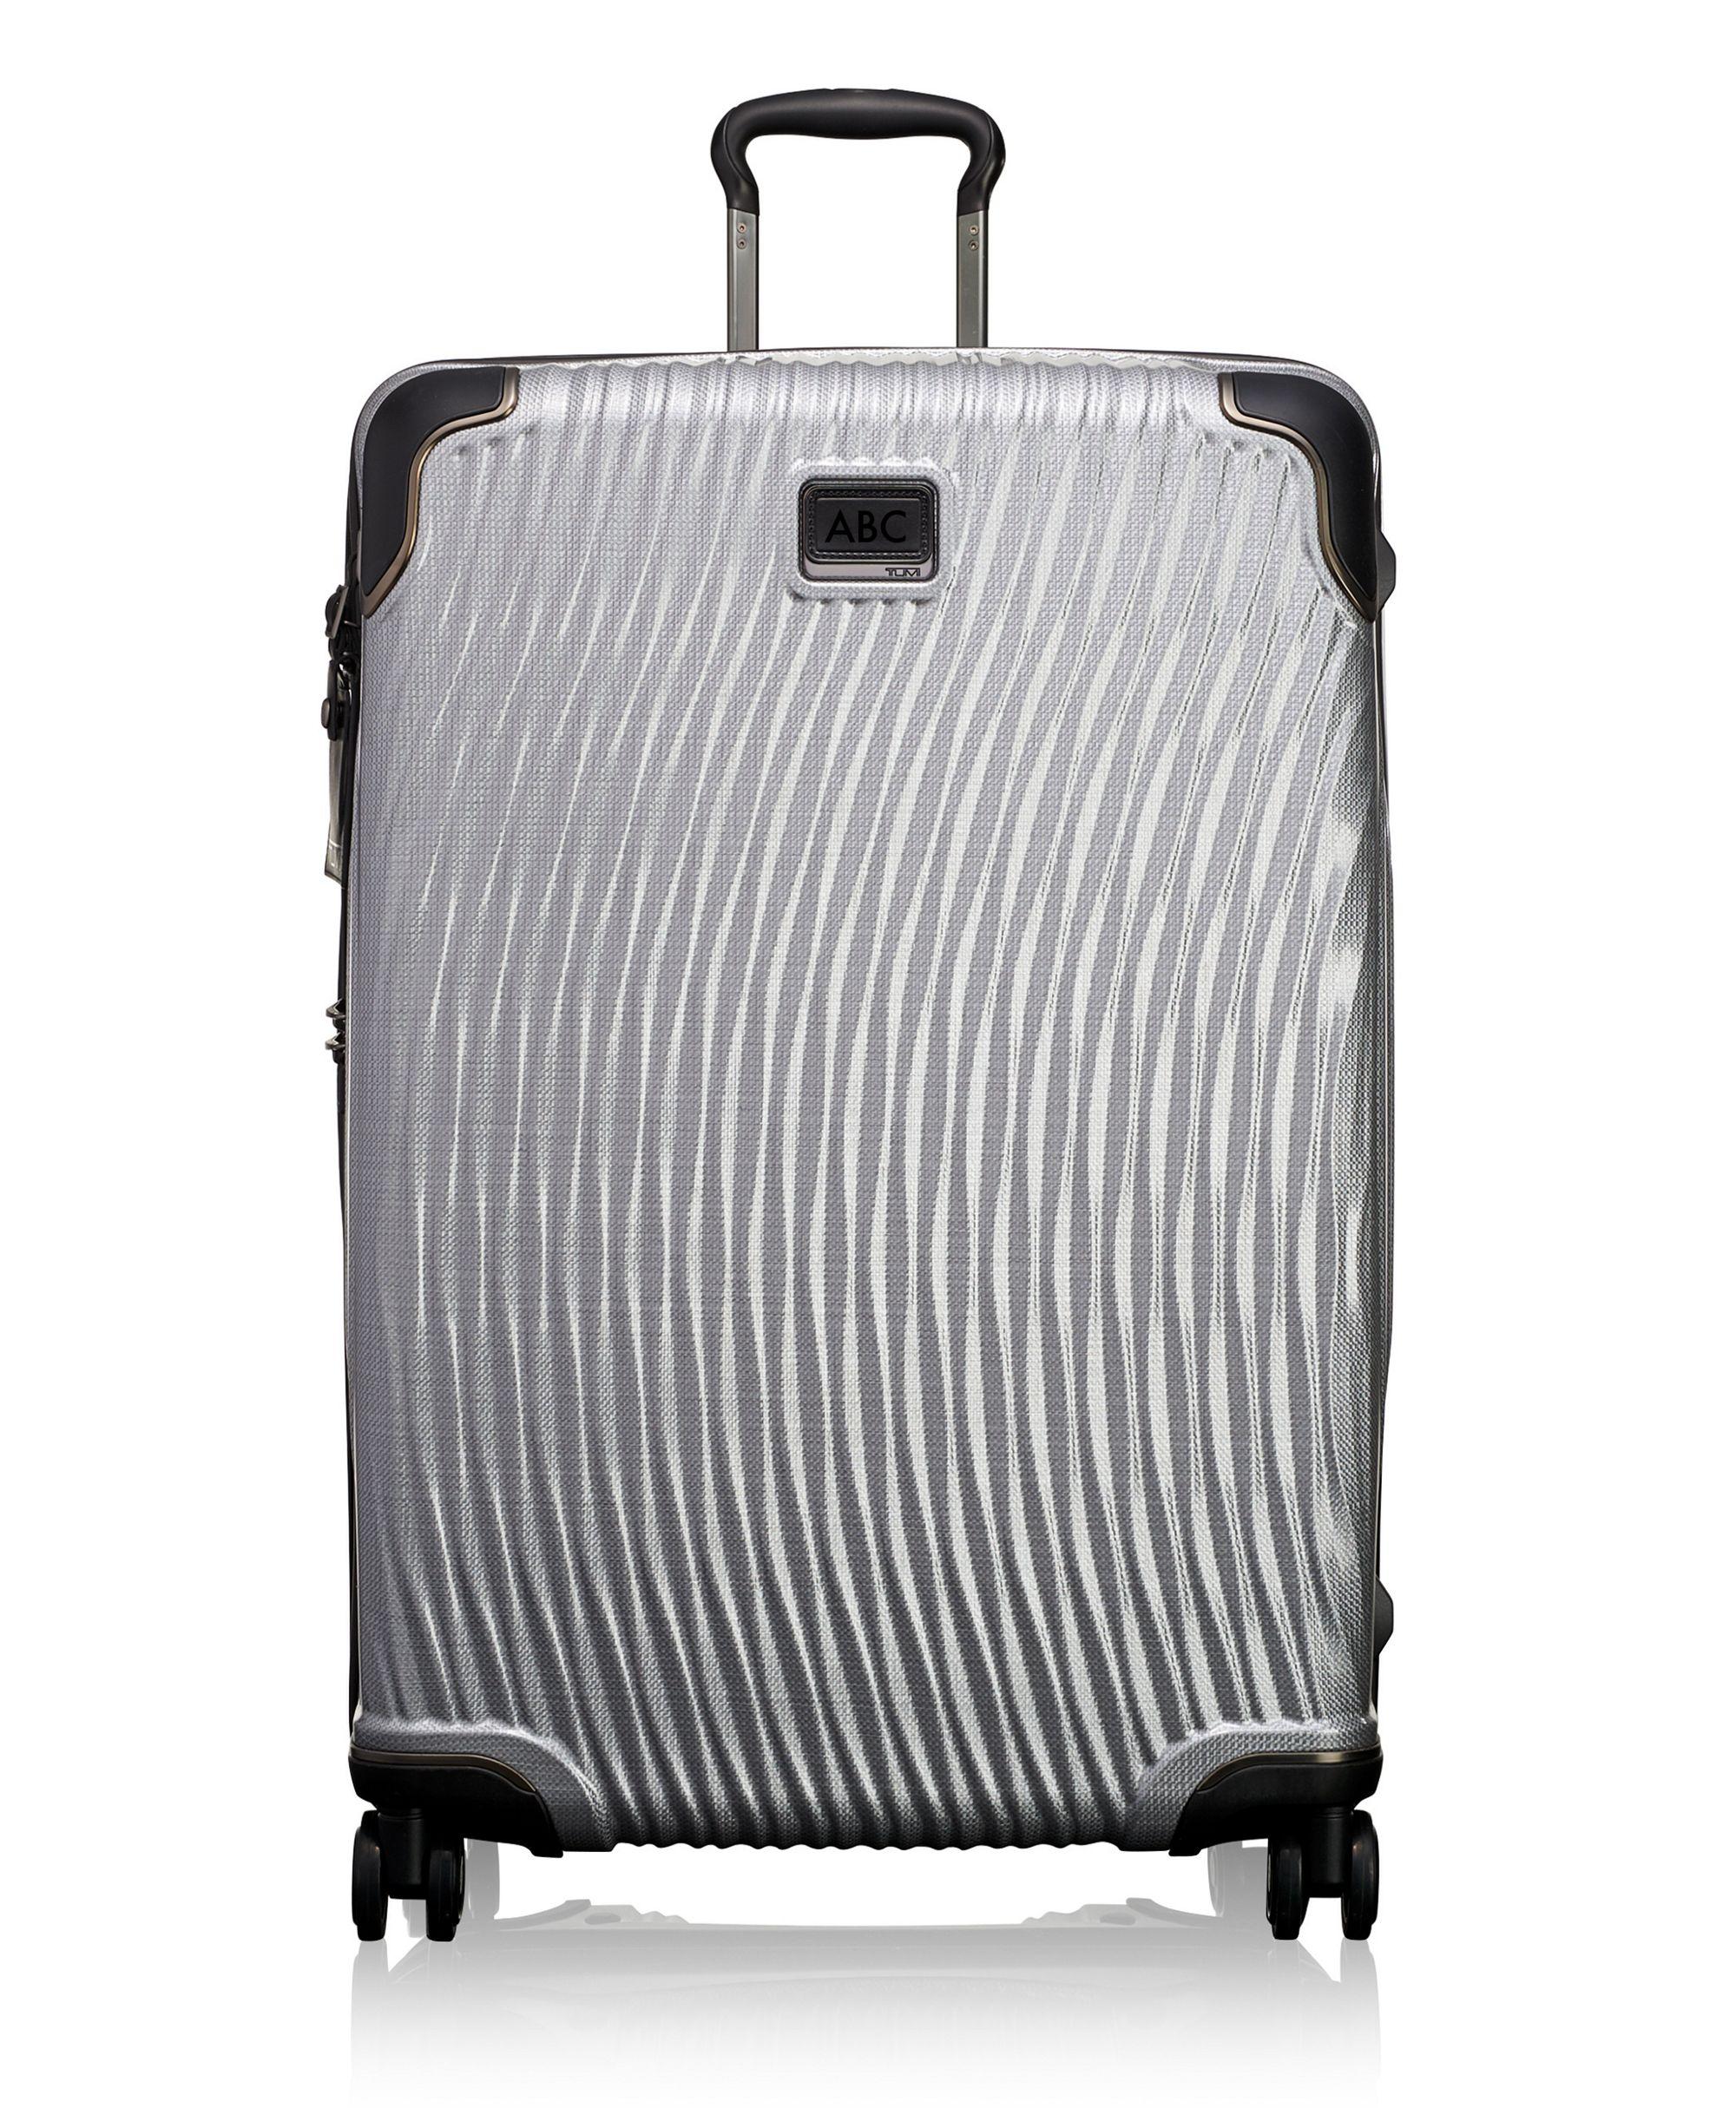 extended trip packing case tumi latitude tumi united states